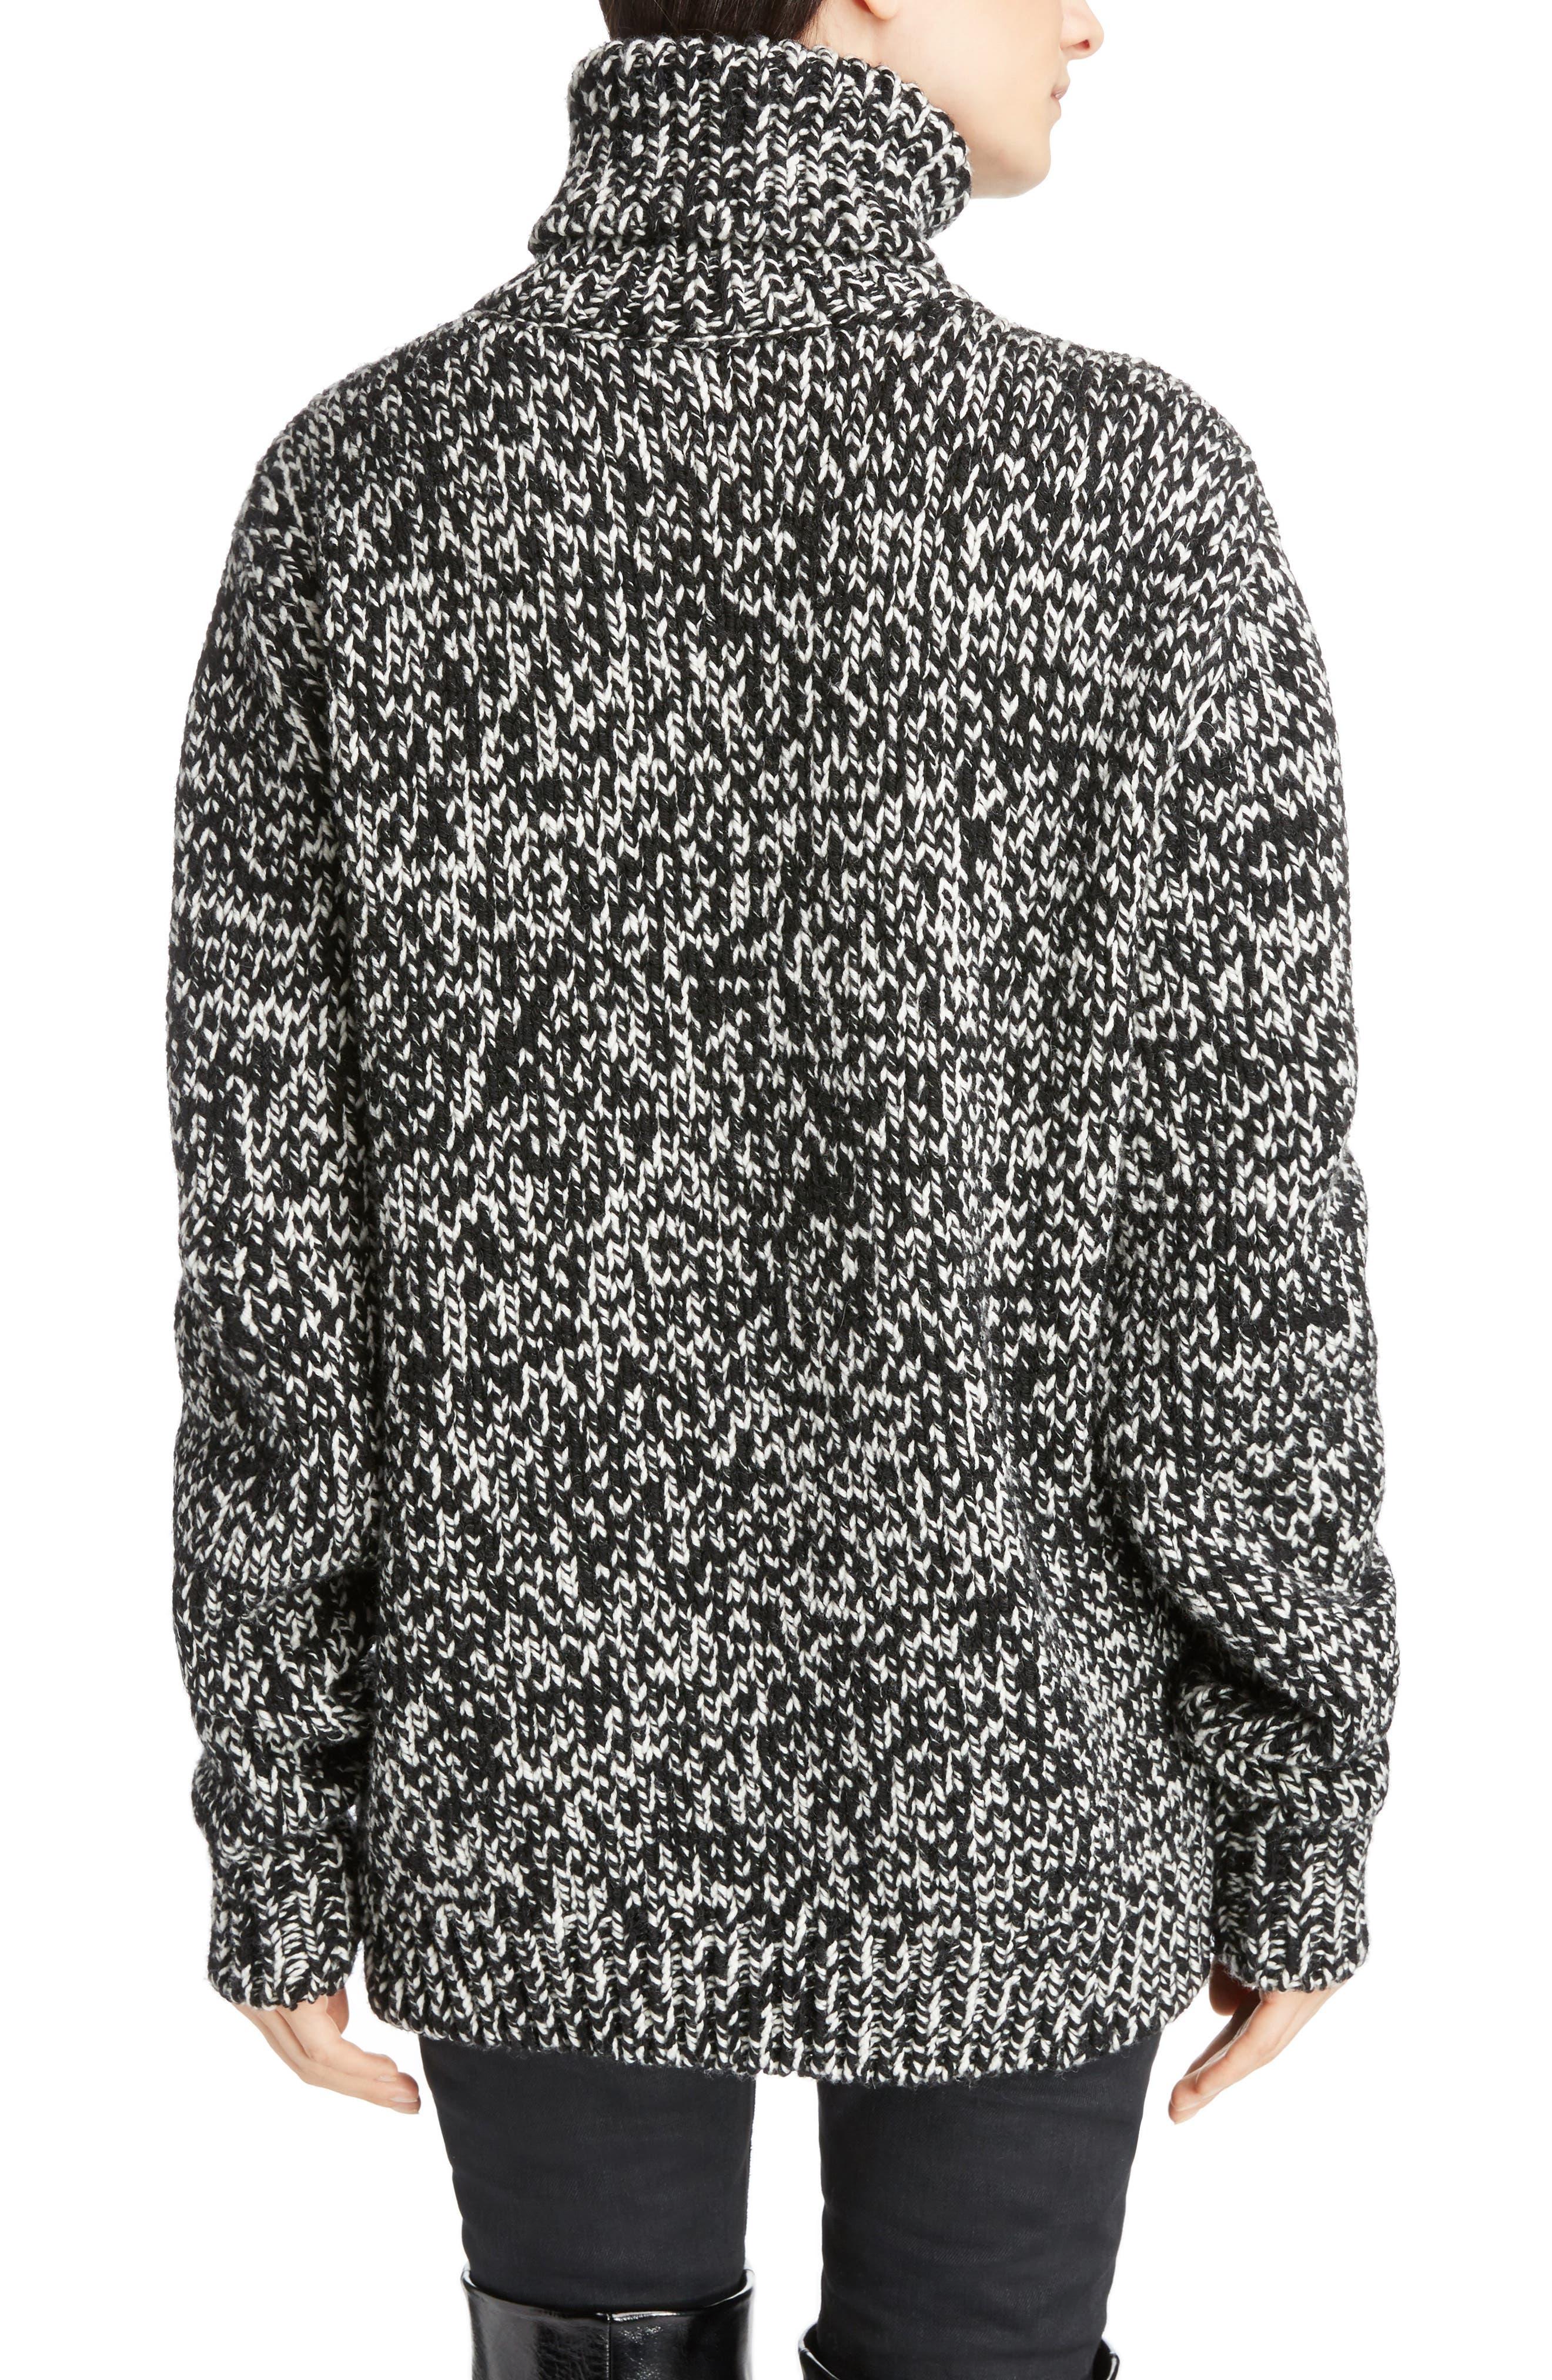 Mélange Knit Wool Turtleneck Sweater,                             Alternate thumbnail 2, color,                             Natural/ Black